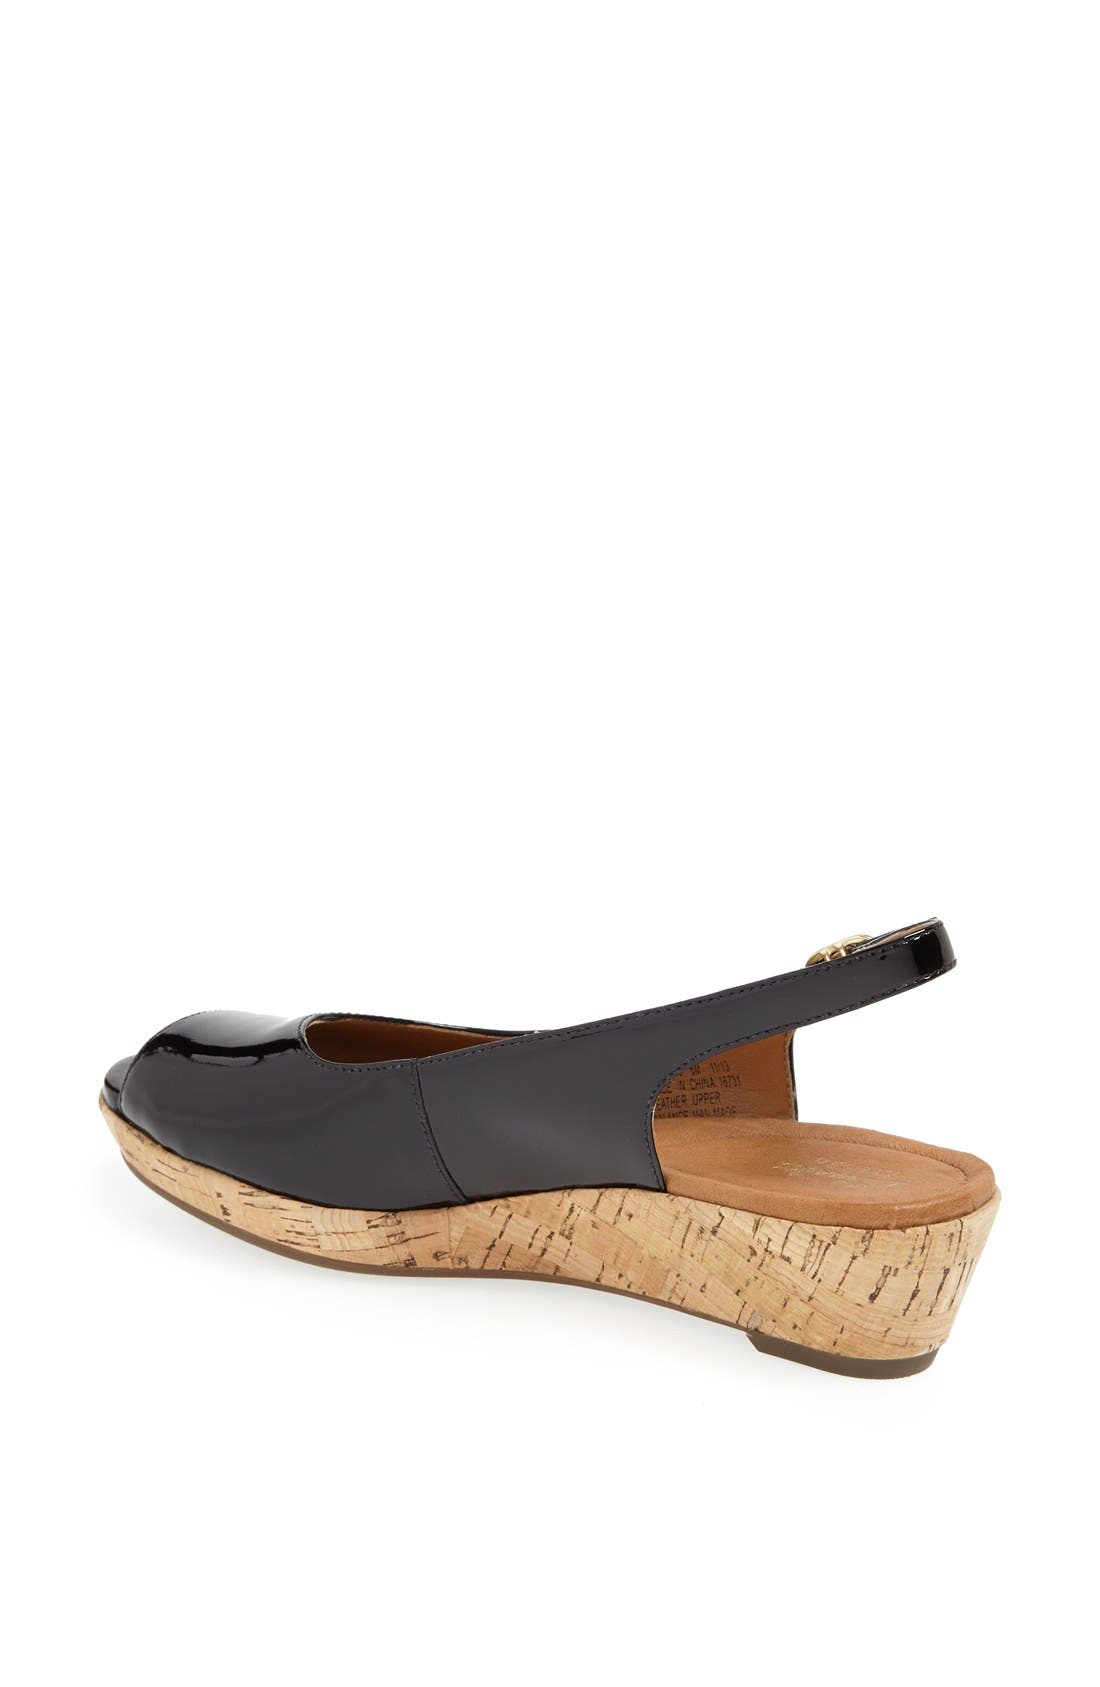 Alternate Image 2  - Clarks® 'Orlena Currant' Sandal (Regular Retail Price: $99.95)